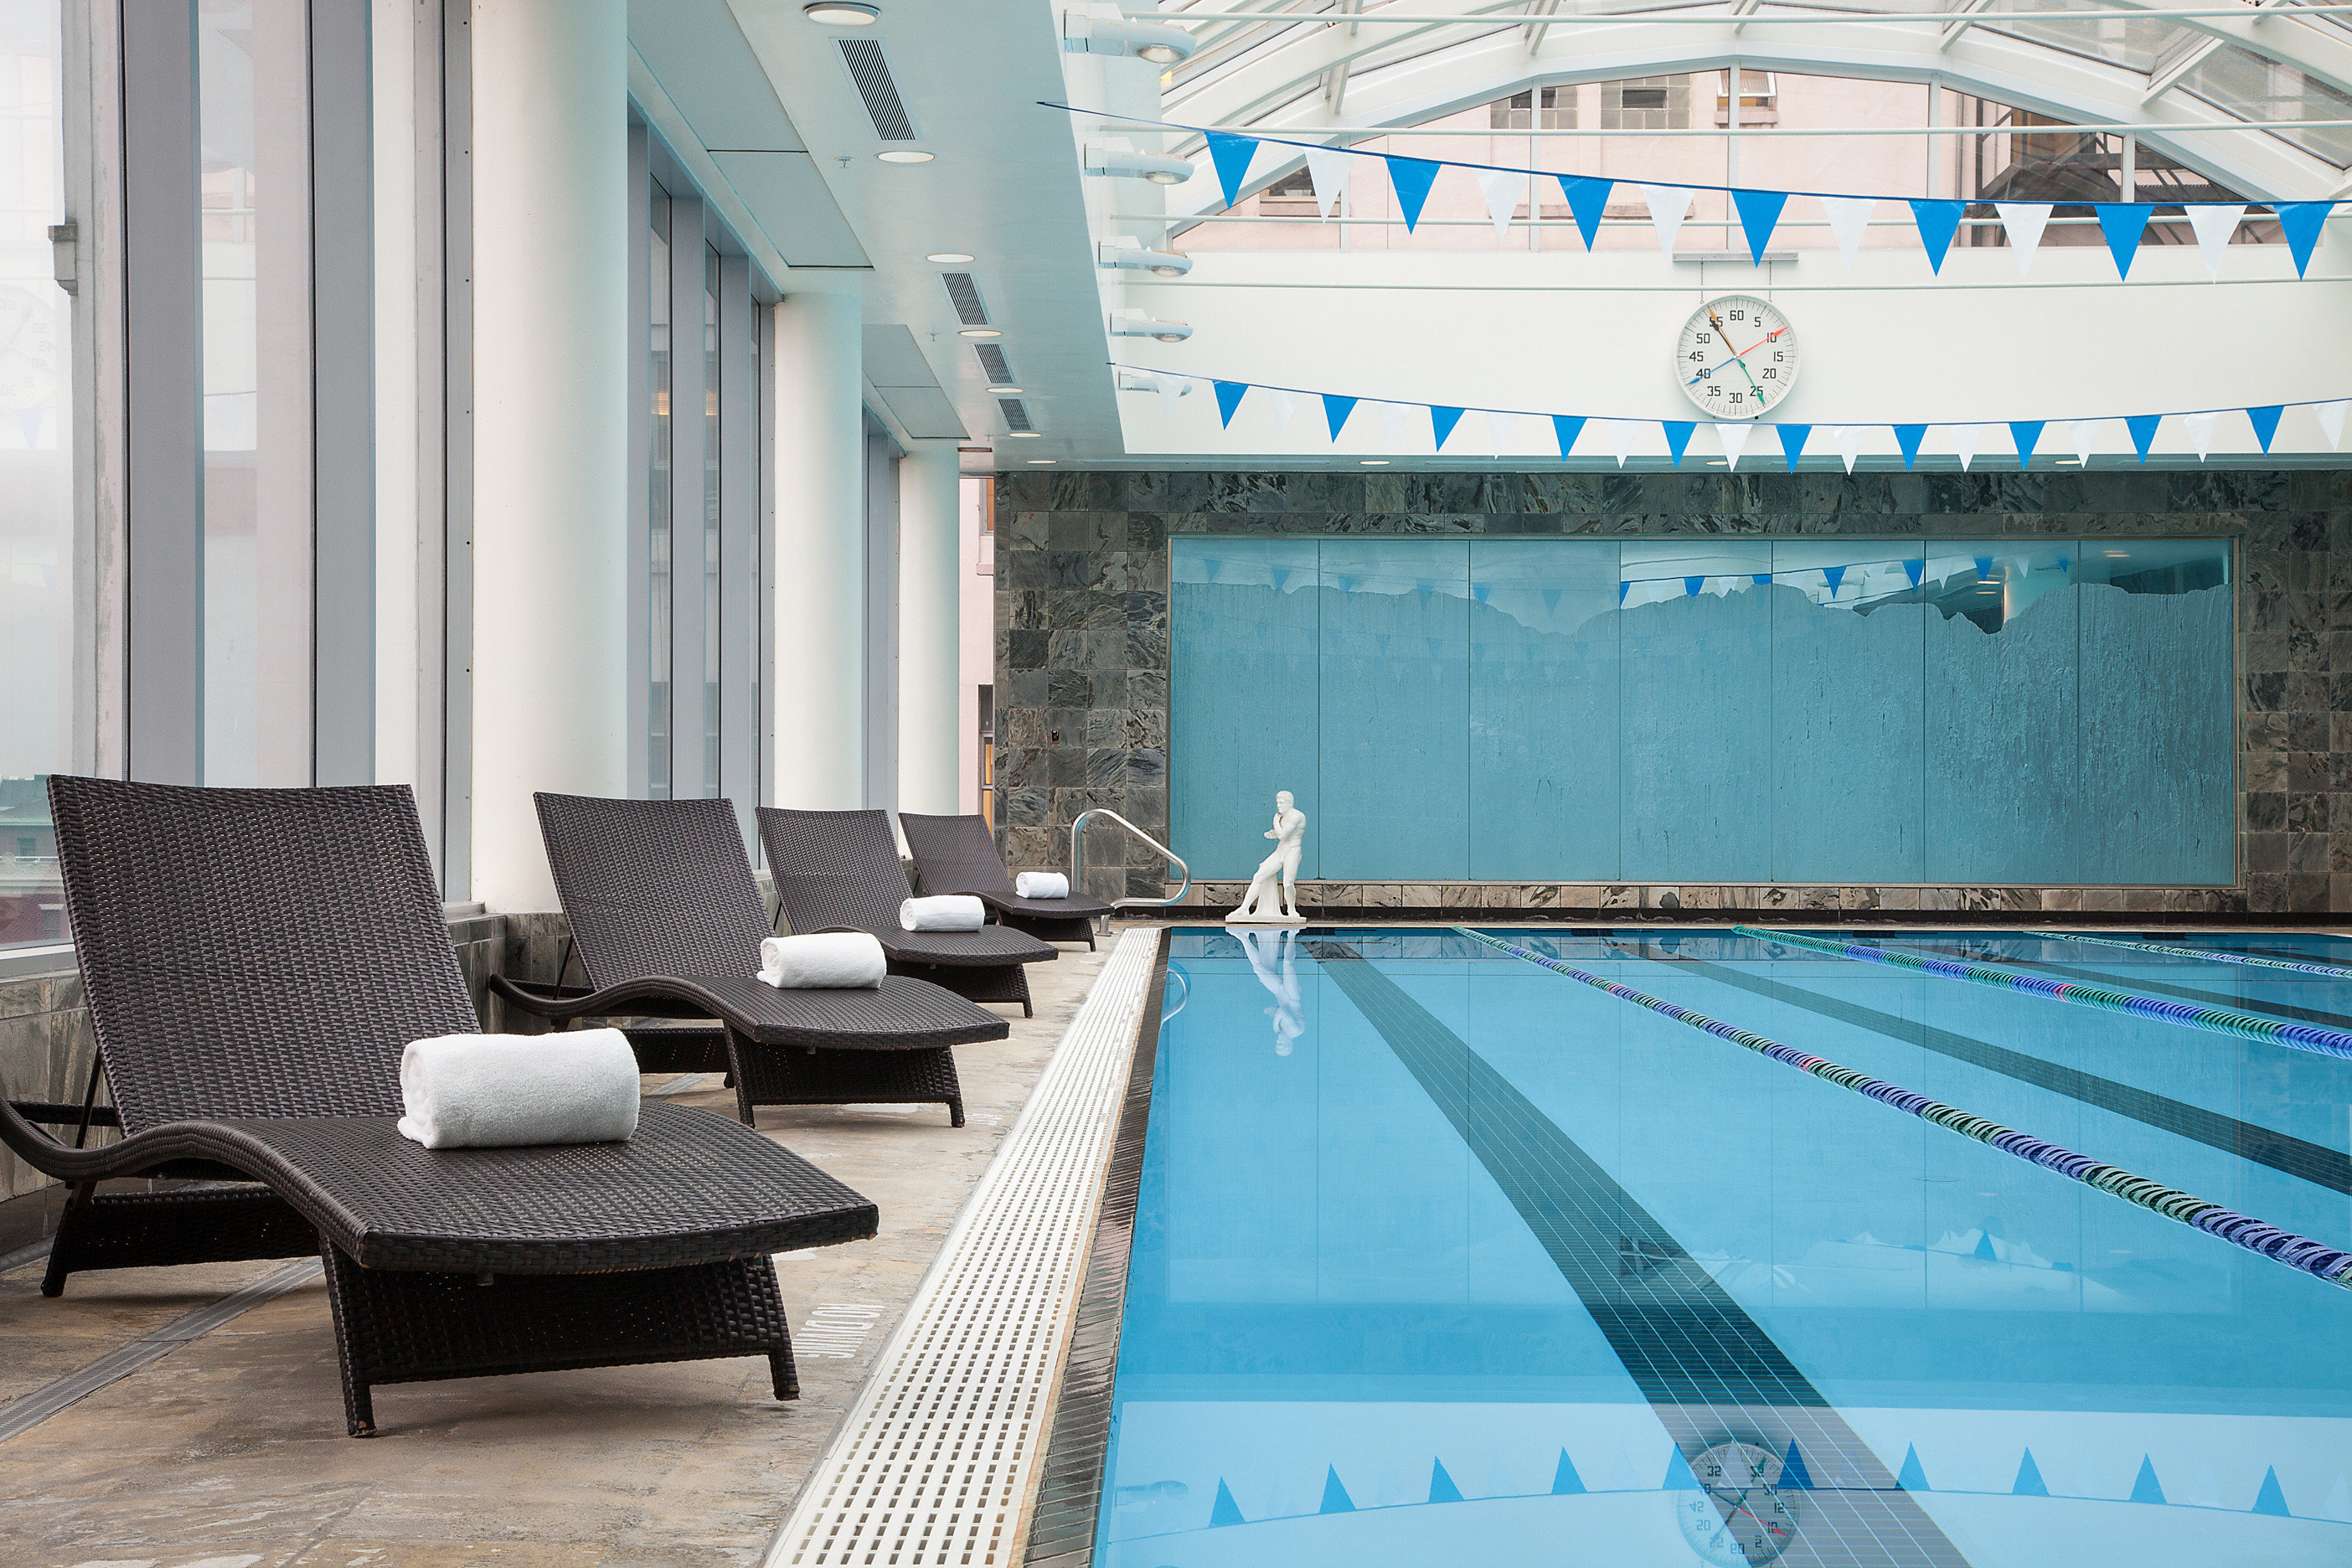 swimming pool leisure leisure centre